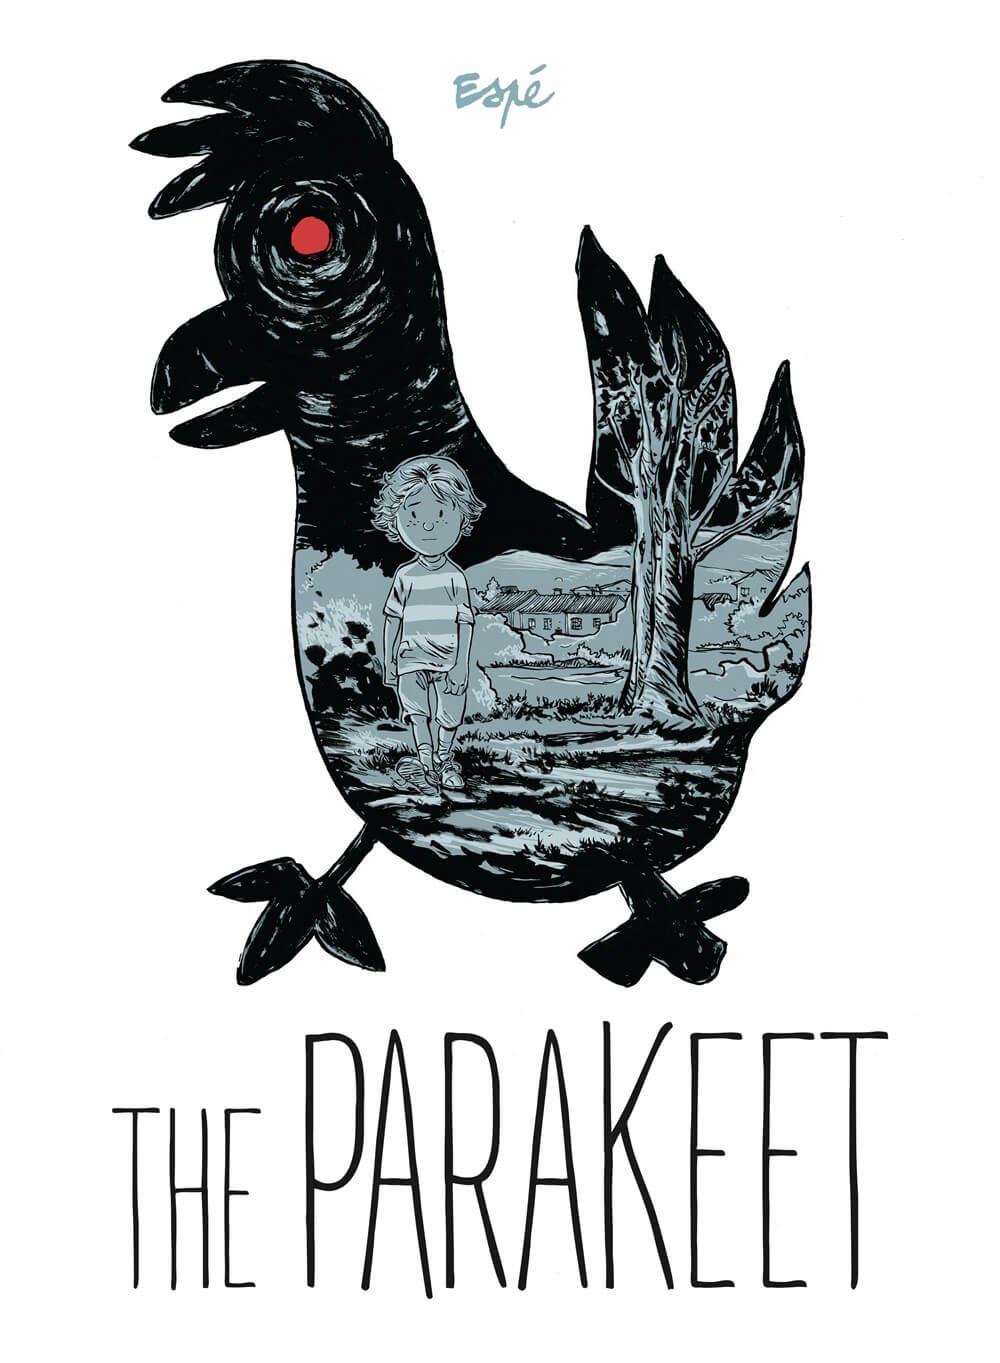 The Parakeet